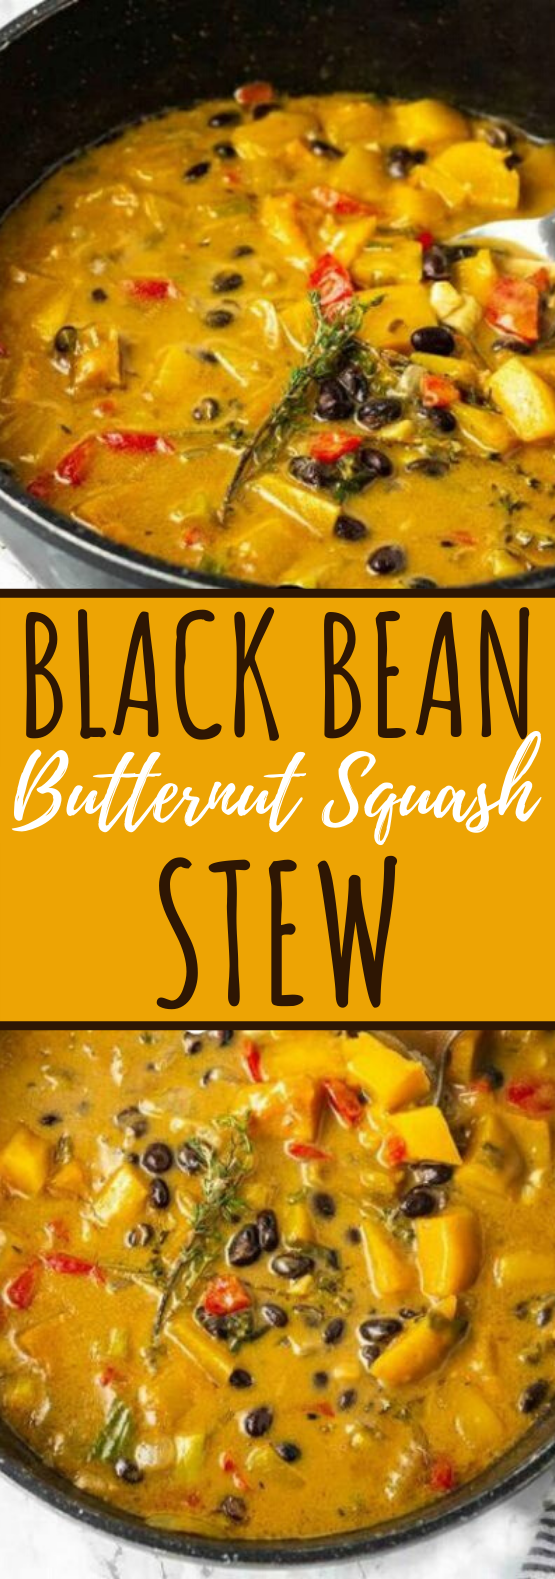 Black Bean Butternut Squash Stew #vegan #dinner #soup #stew #comfortfood